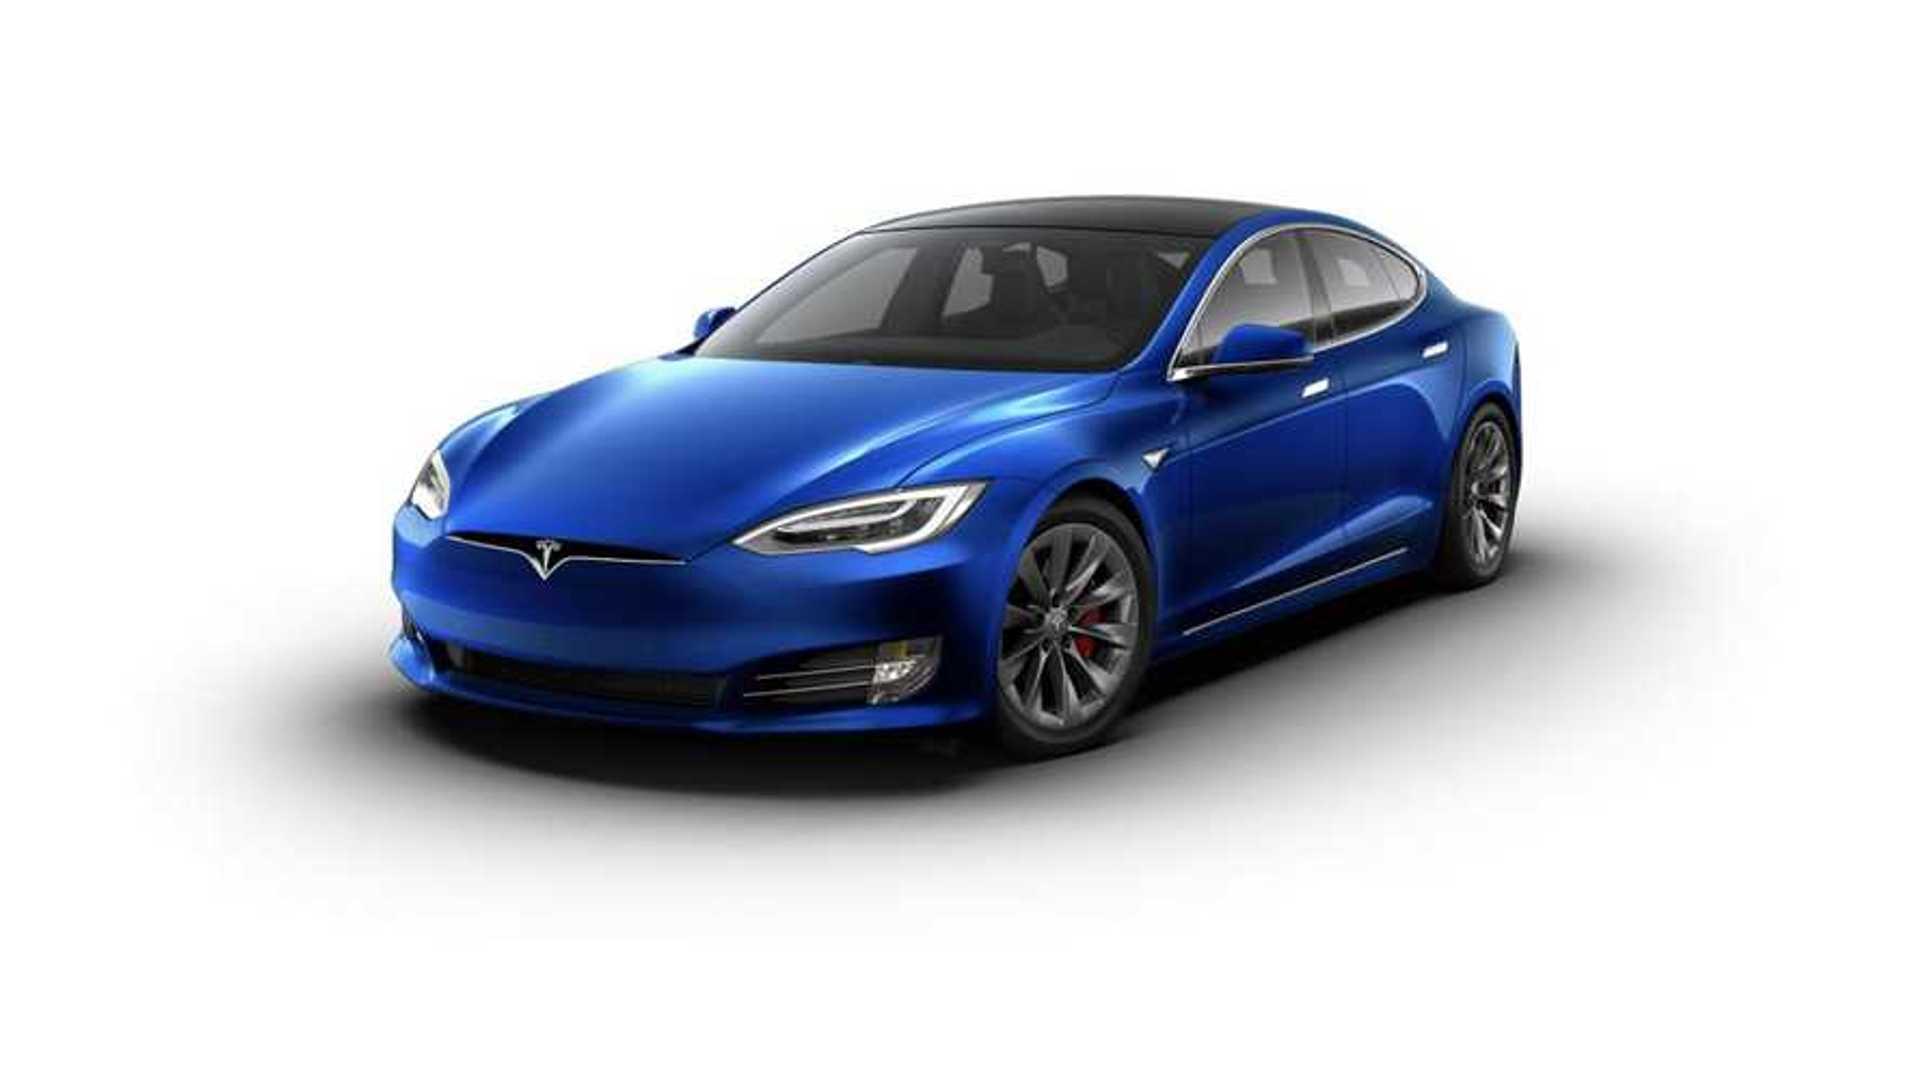 Tesla Model S/X/3 Comparison (Range, Price, Acceleration